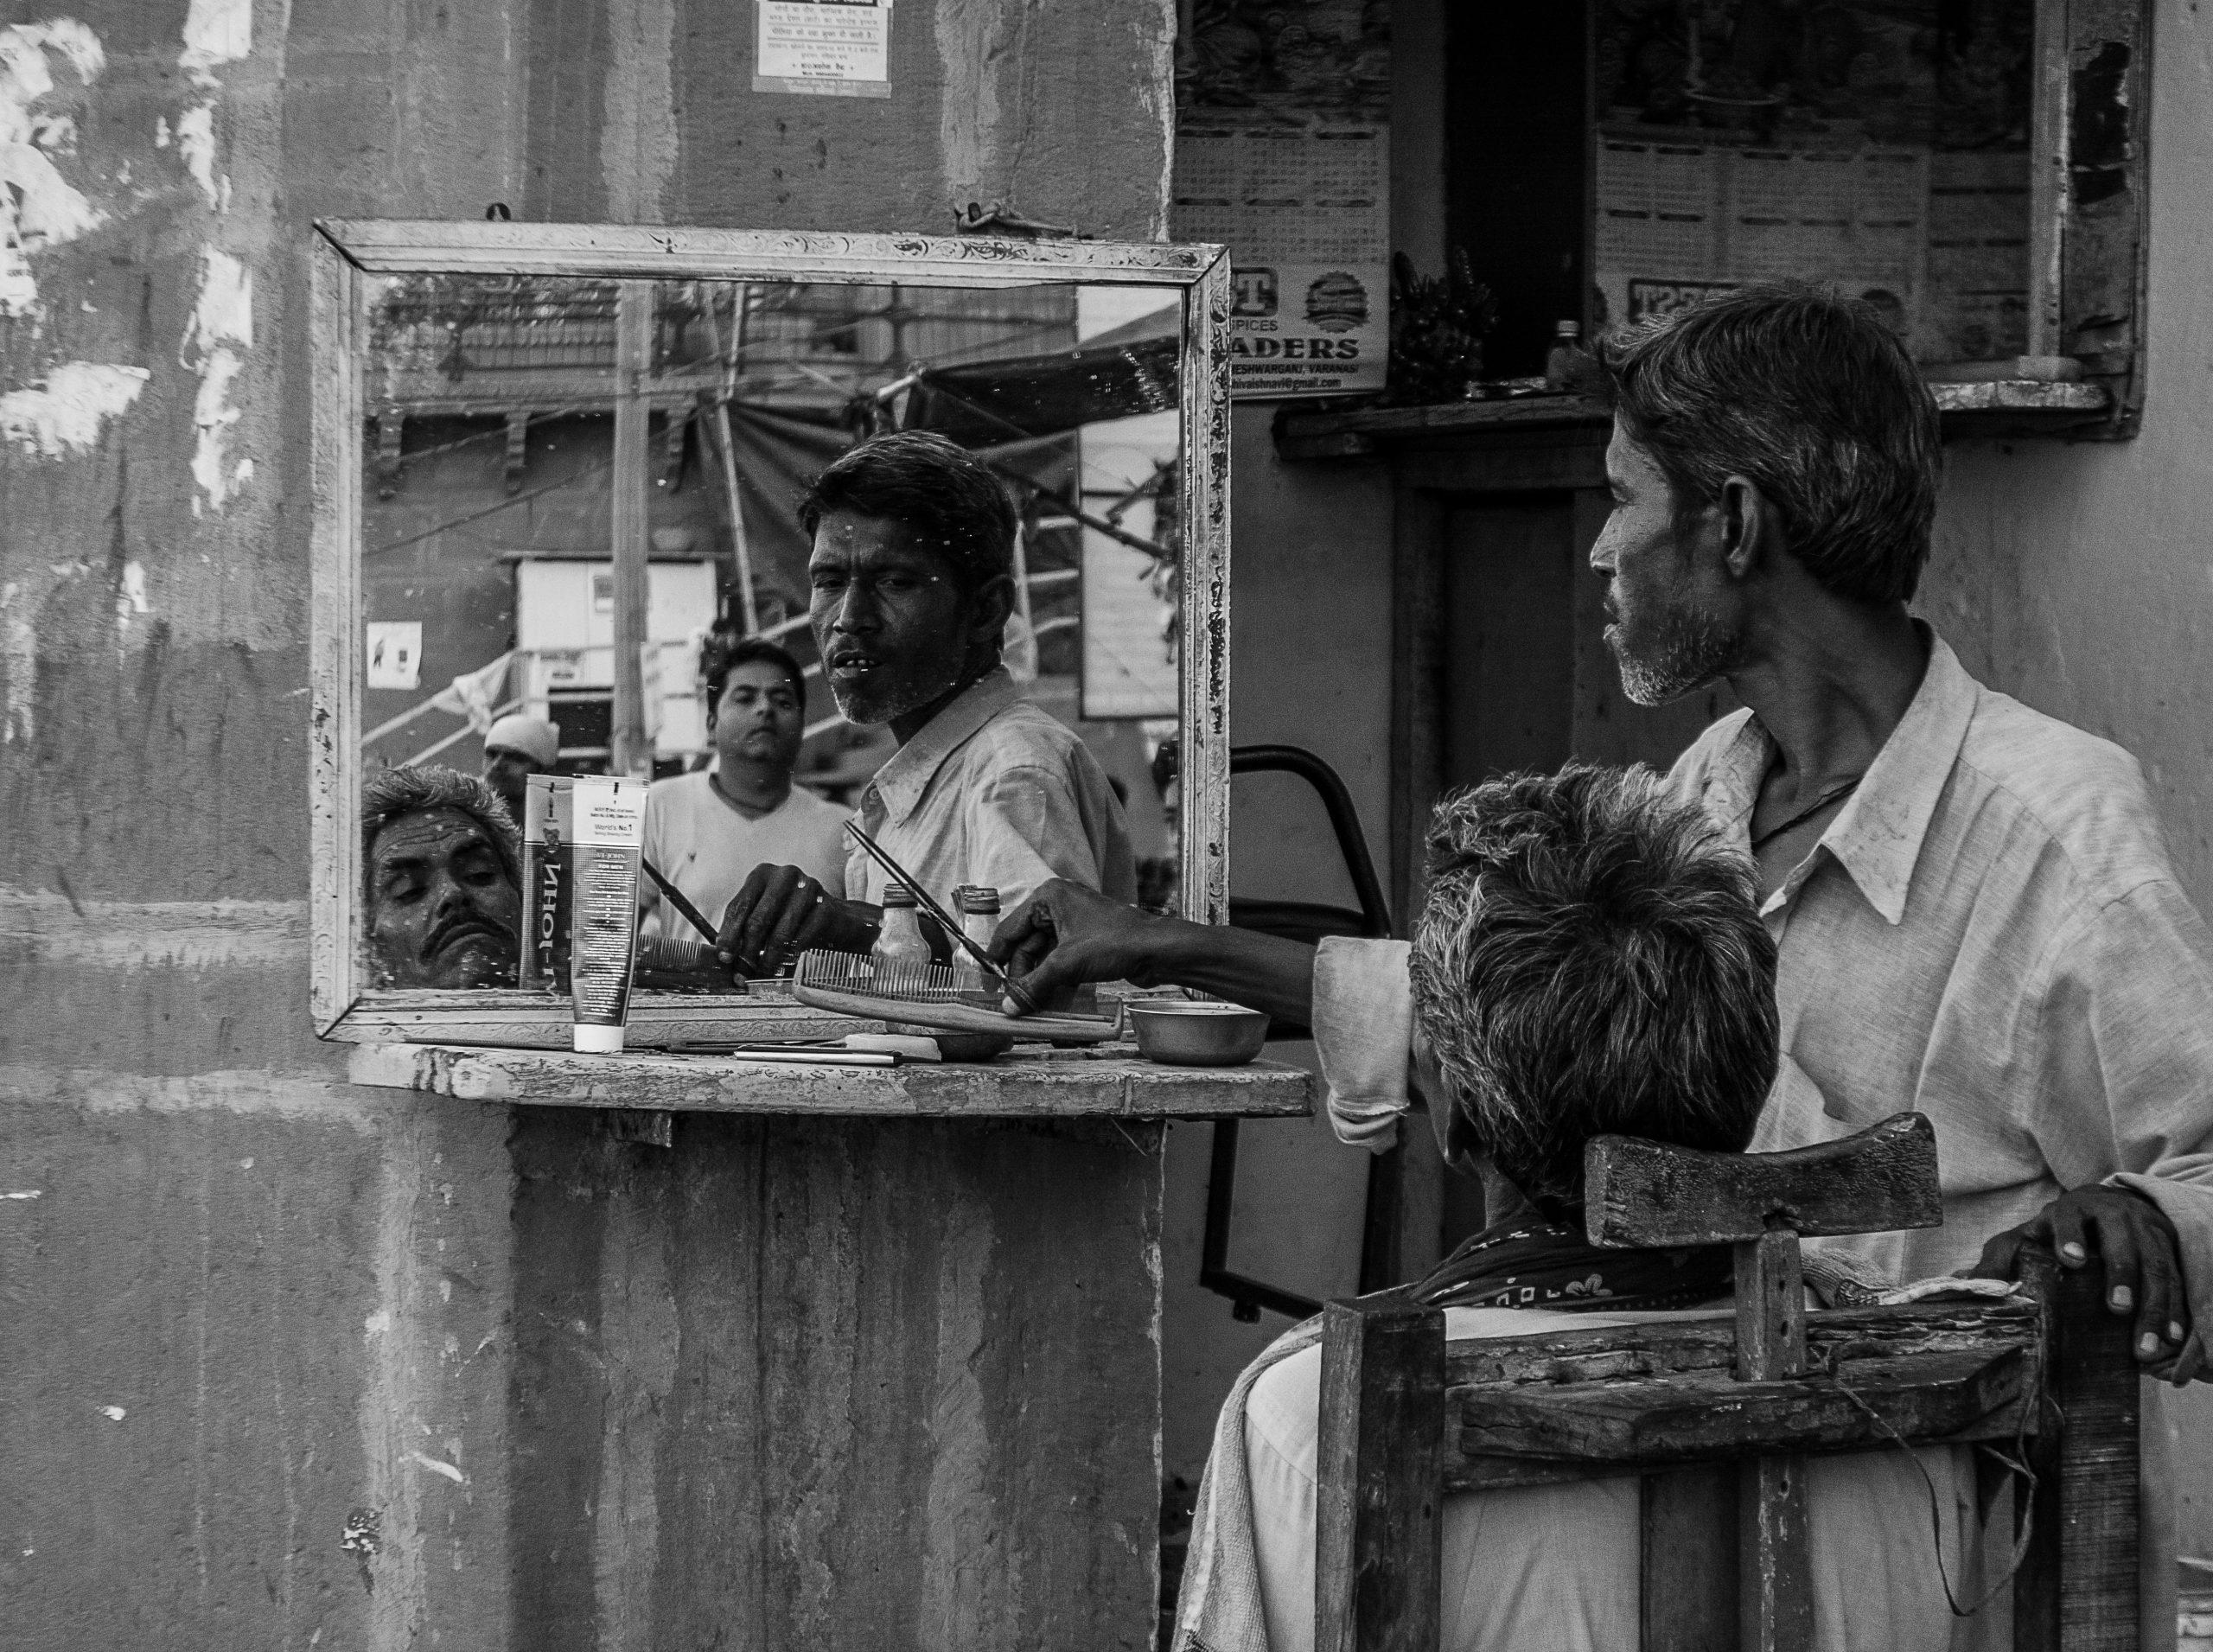 A barber shop in a street